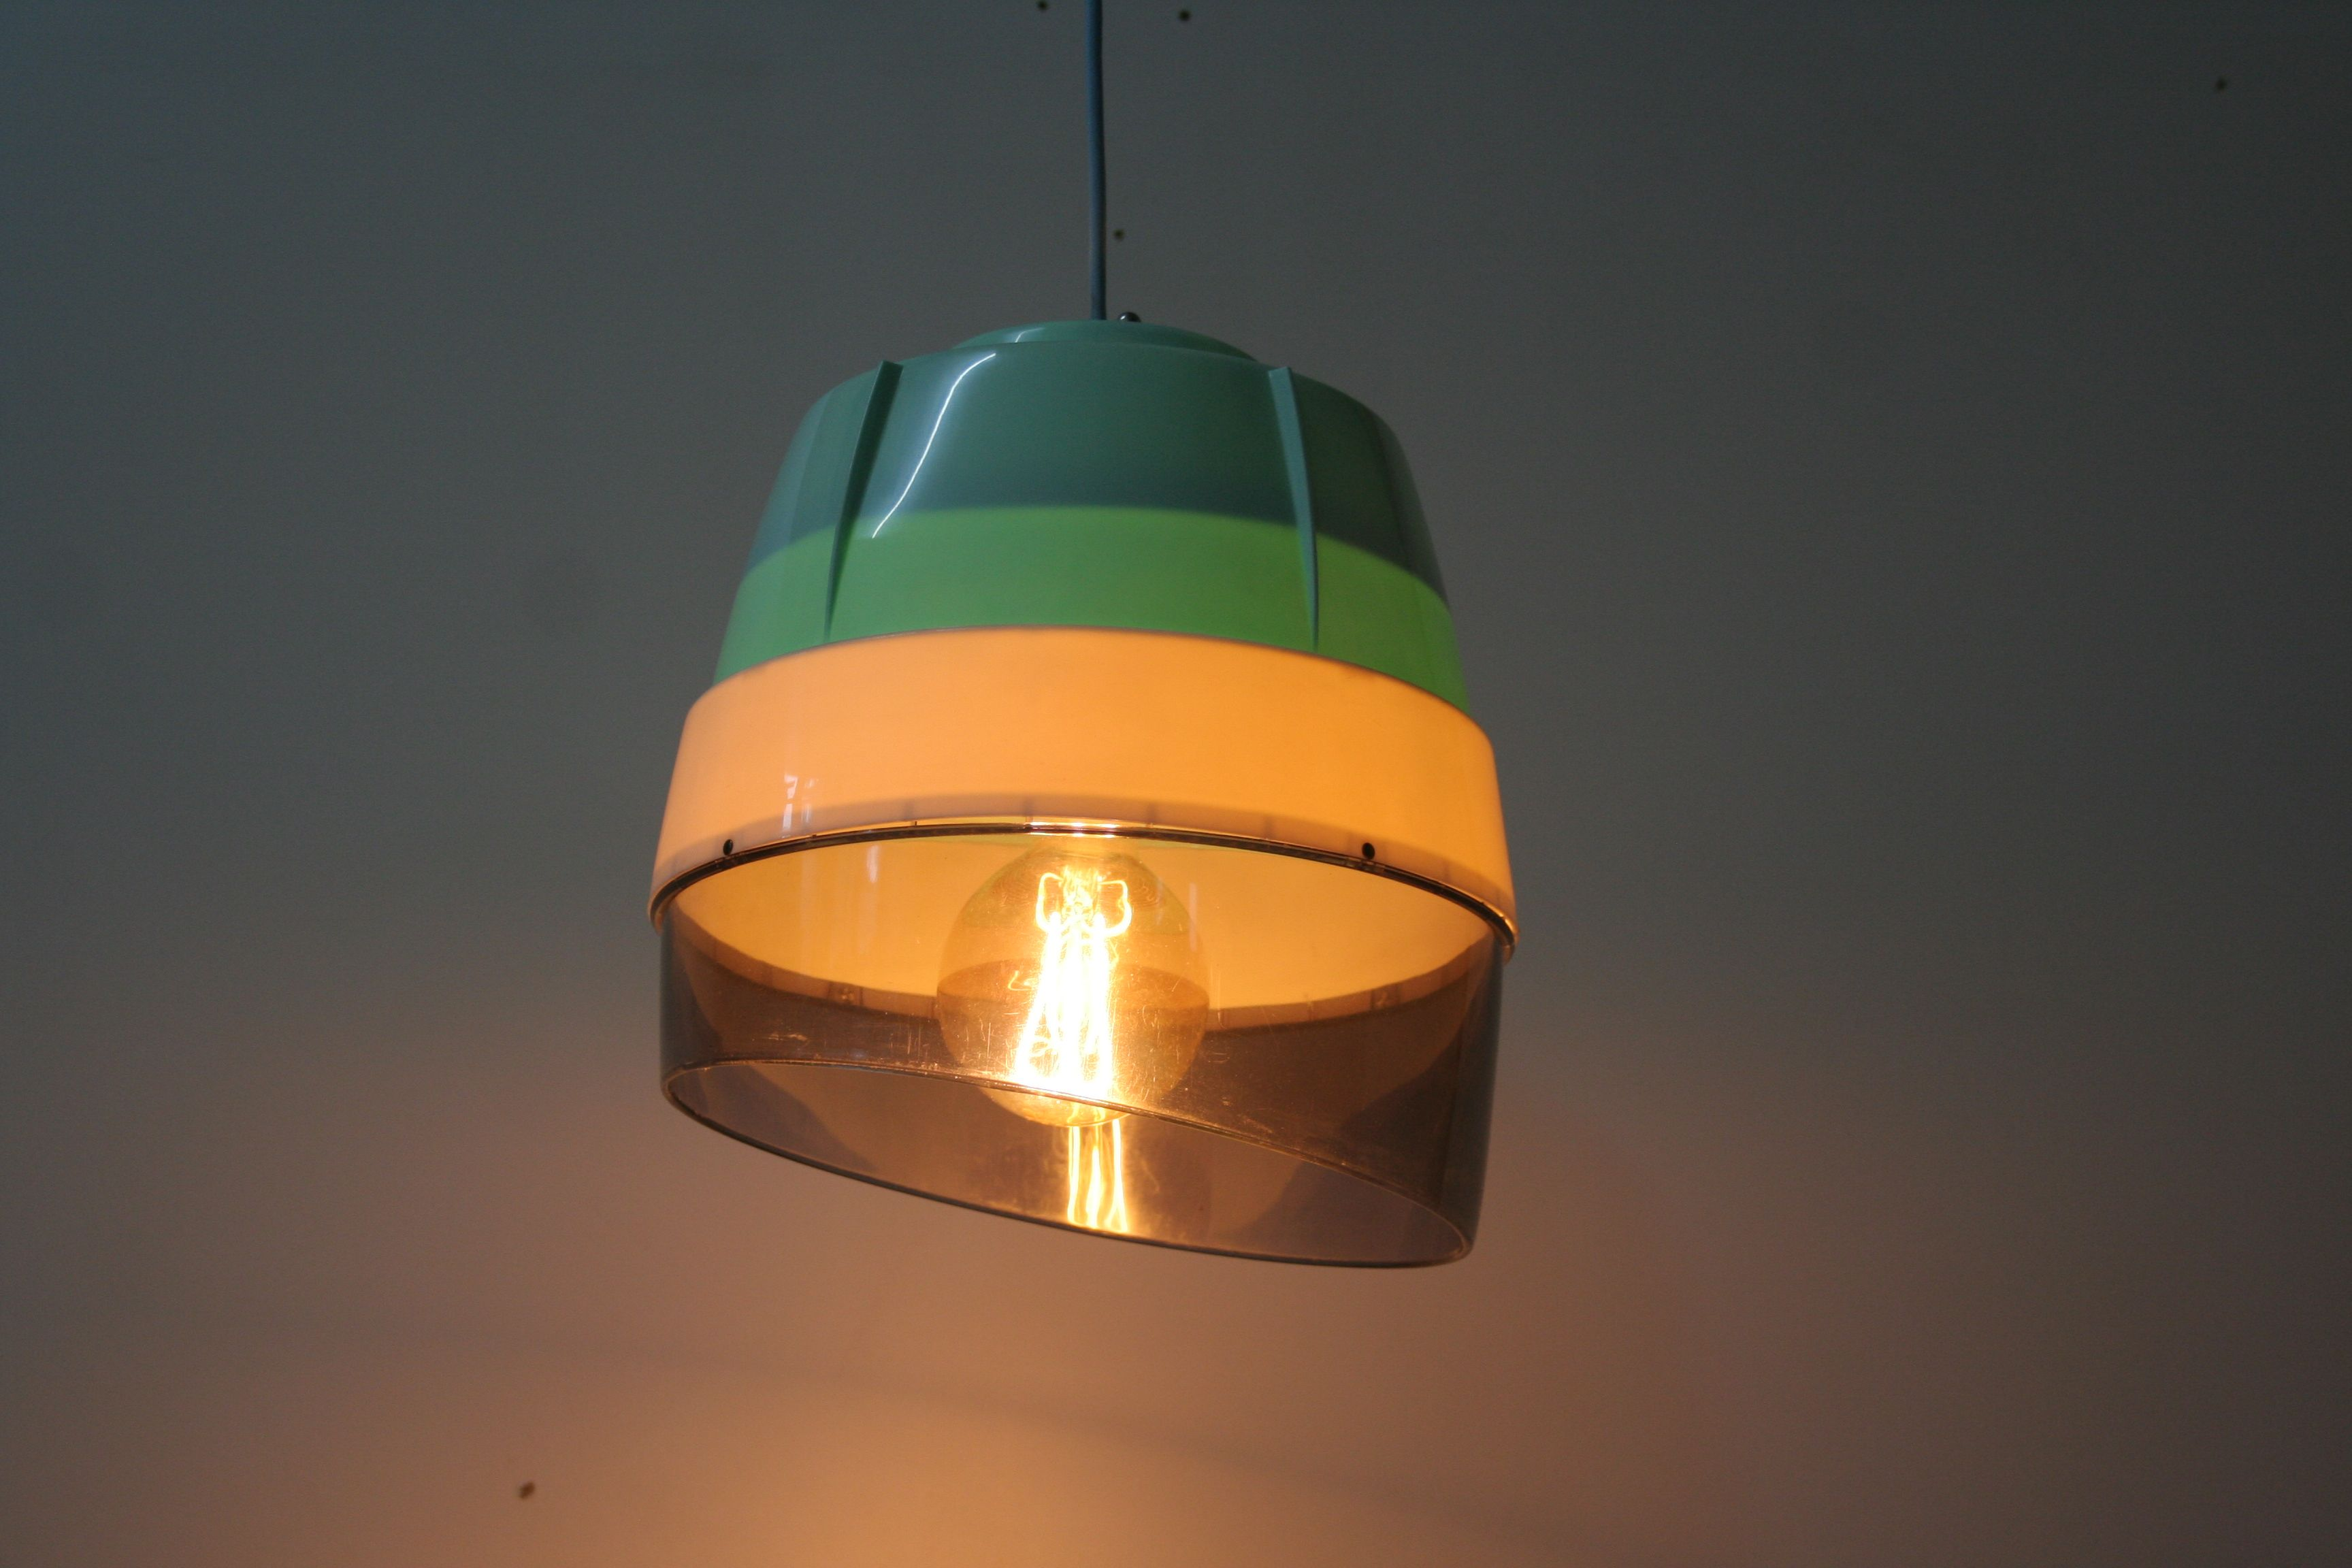 Hangelampe Aus Alter Trockenhaube Upcycling Upcycling Lampe Hange Lampe